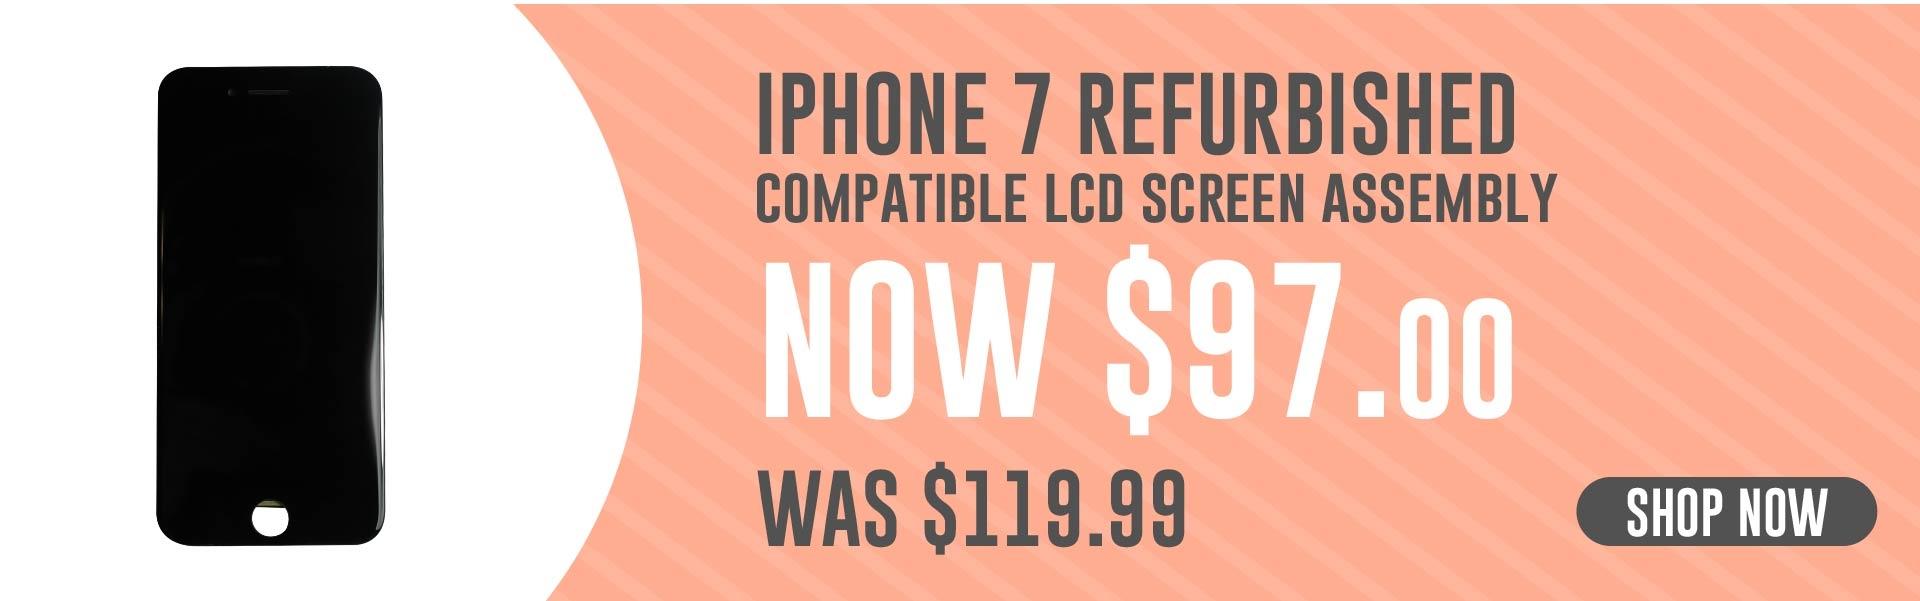 iPhone 7 Refurbished Banner